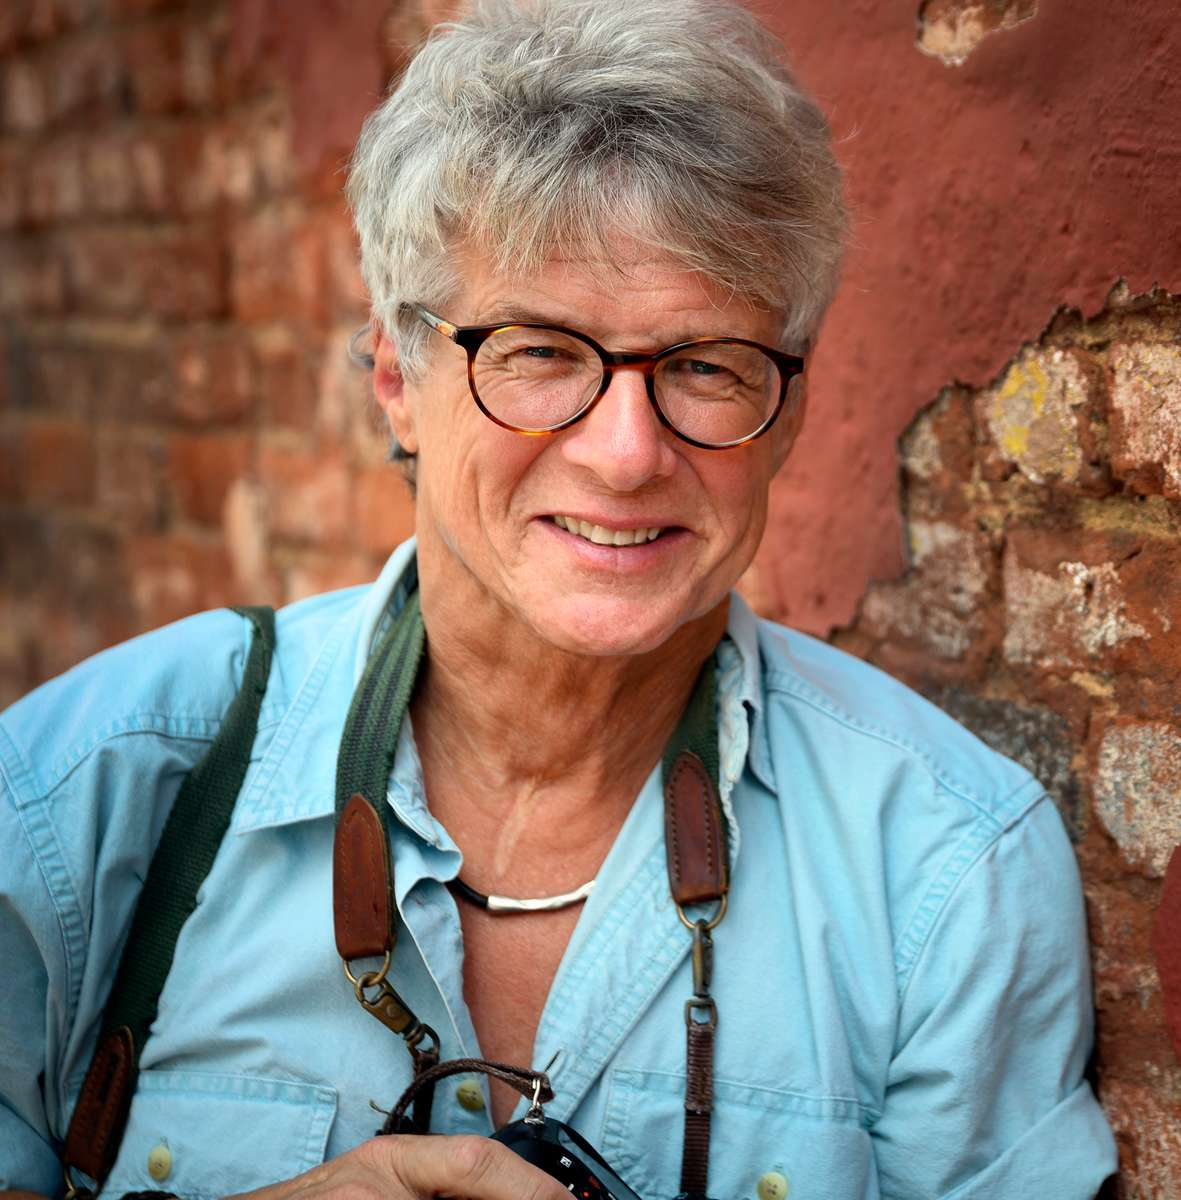 Robin Rayne, Atlanta photojournalist for ZUMA Press